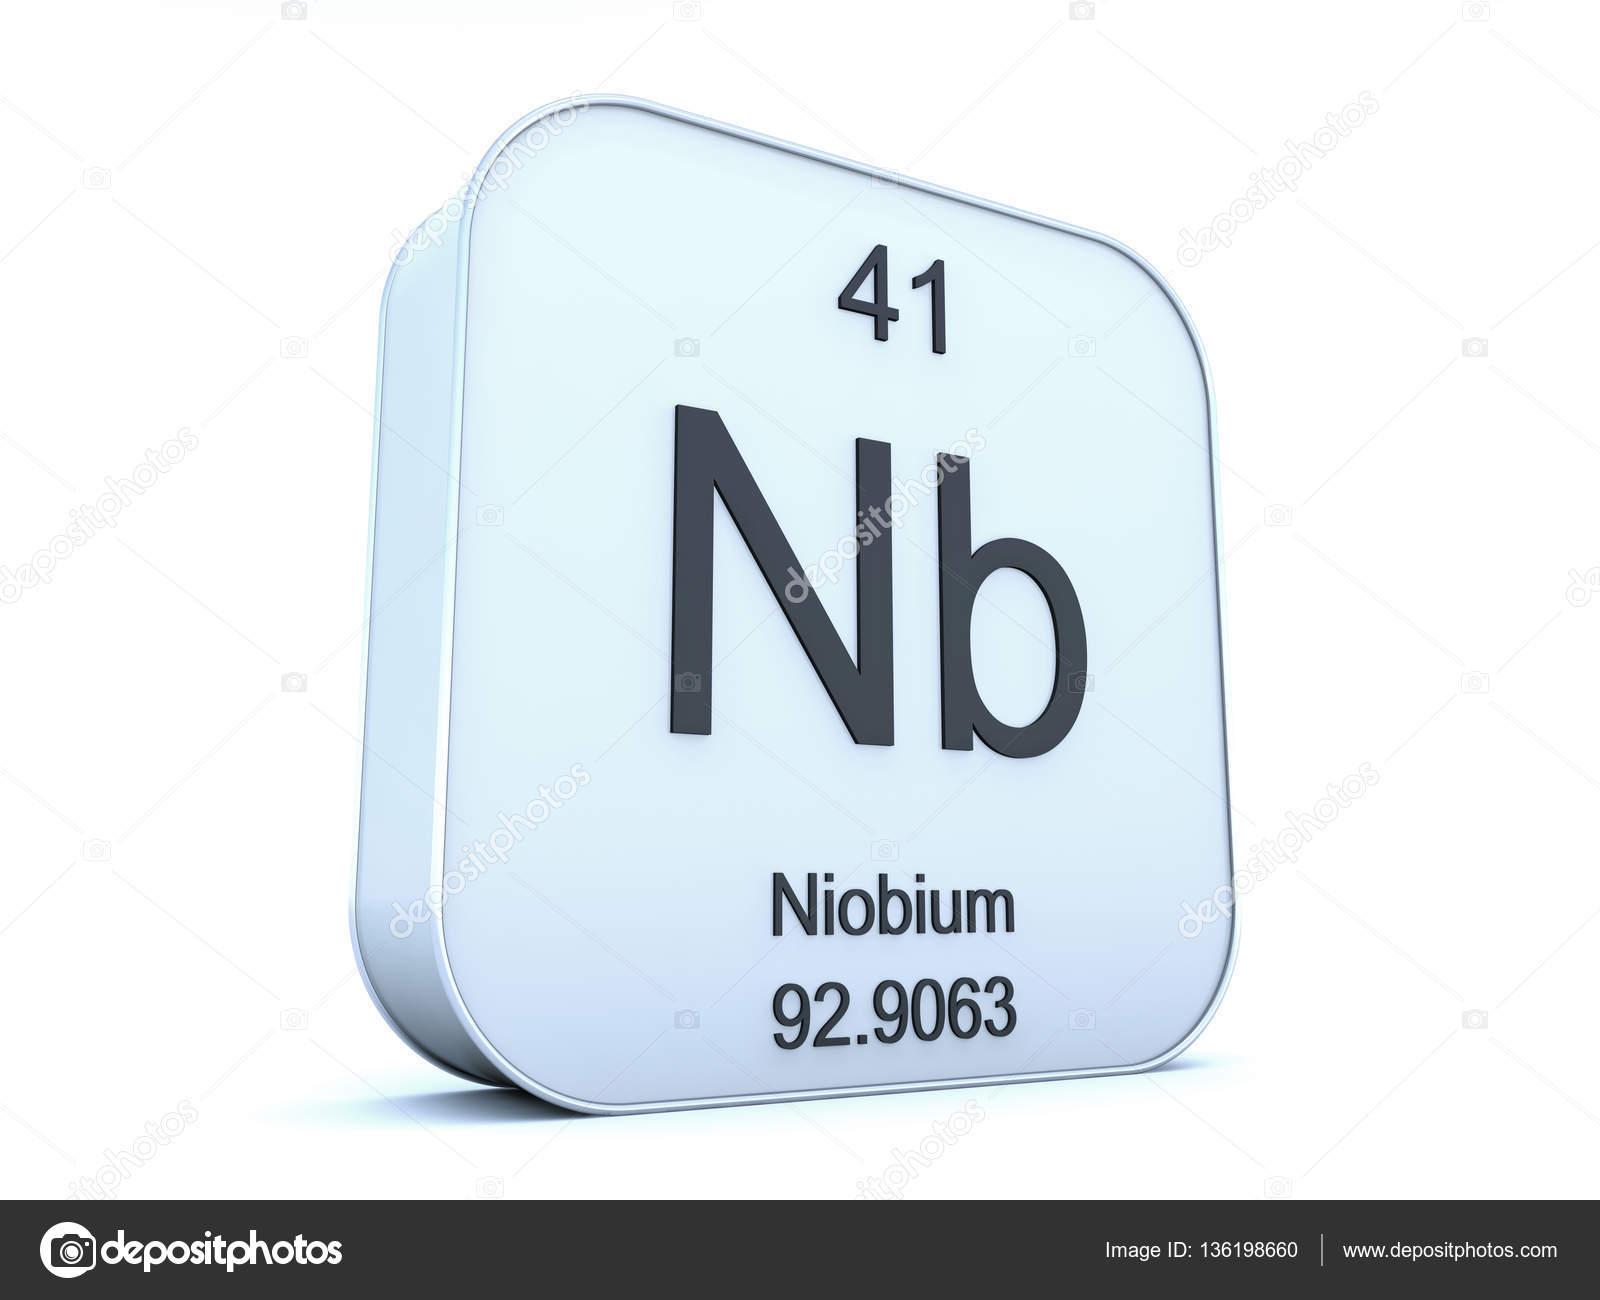 Niobium element on white square icon stock photo conceptw niobium element symbol from the periodic table on white rounded square icon photo by conceptw biocorpaavc